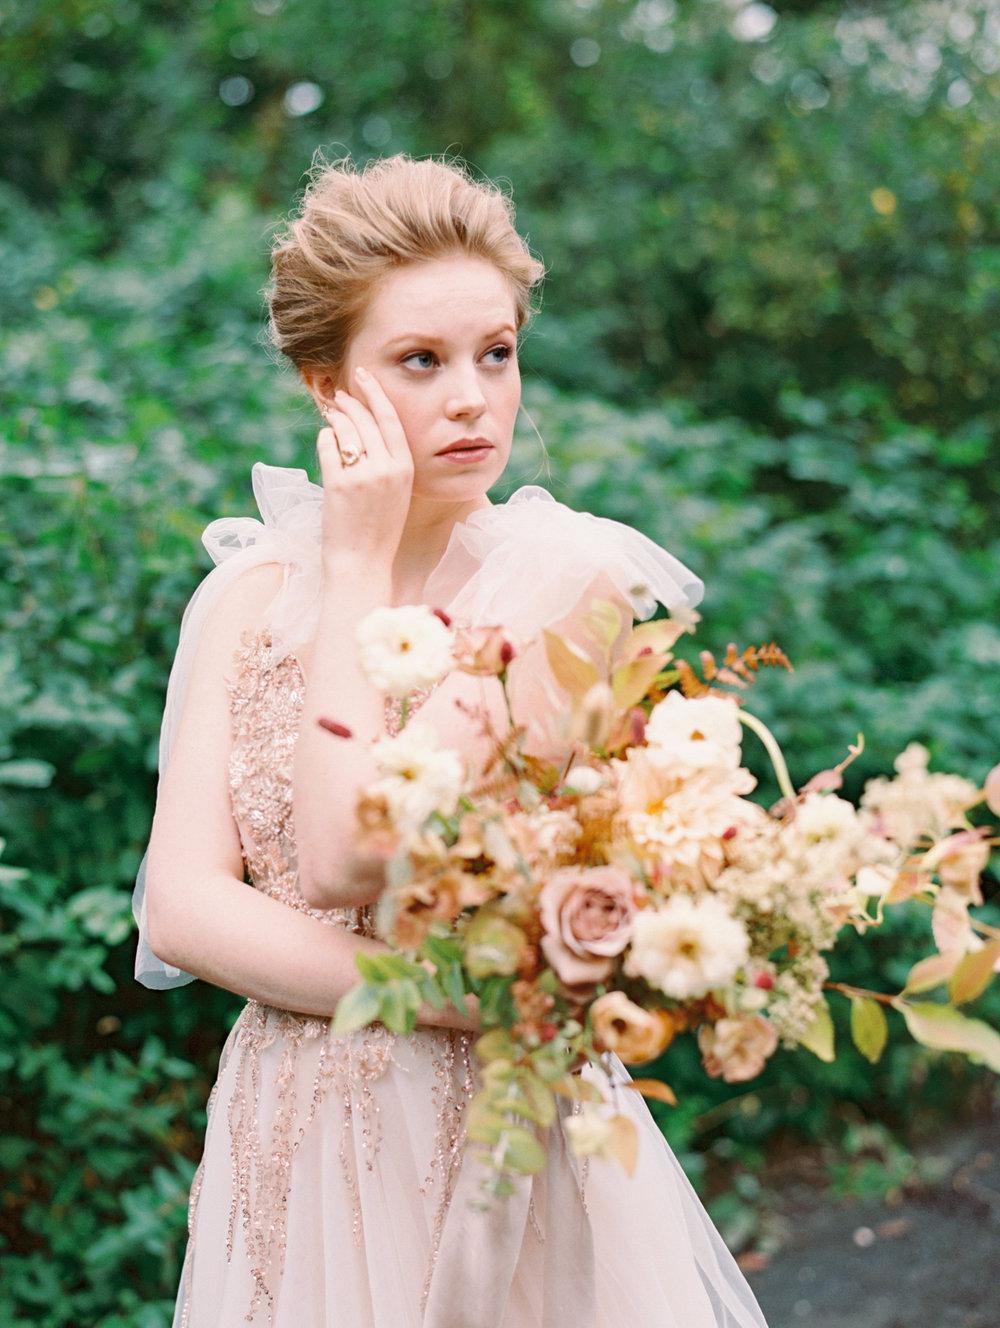 kelsandmichael_bridaleditorial_harvestelopement-22.jpg